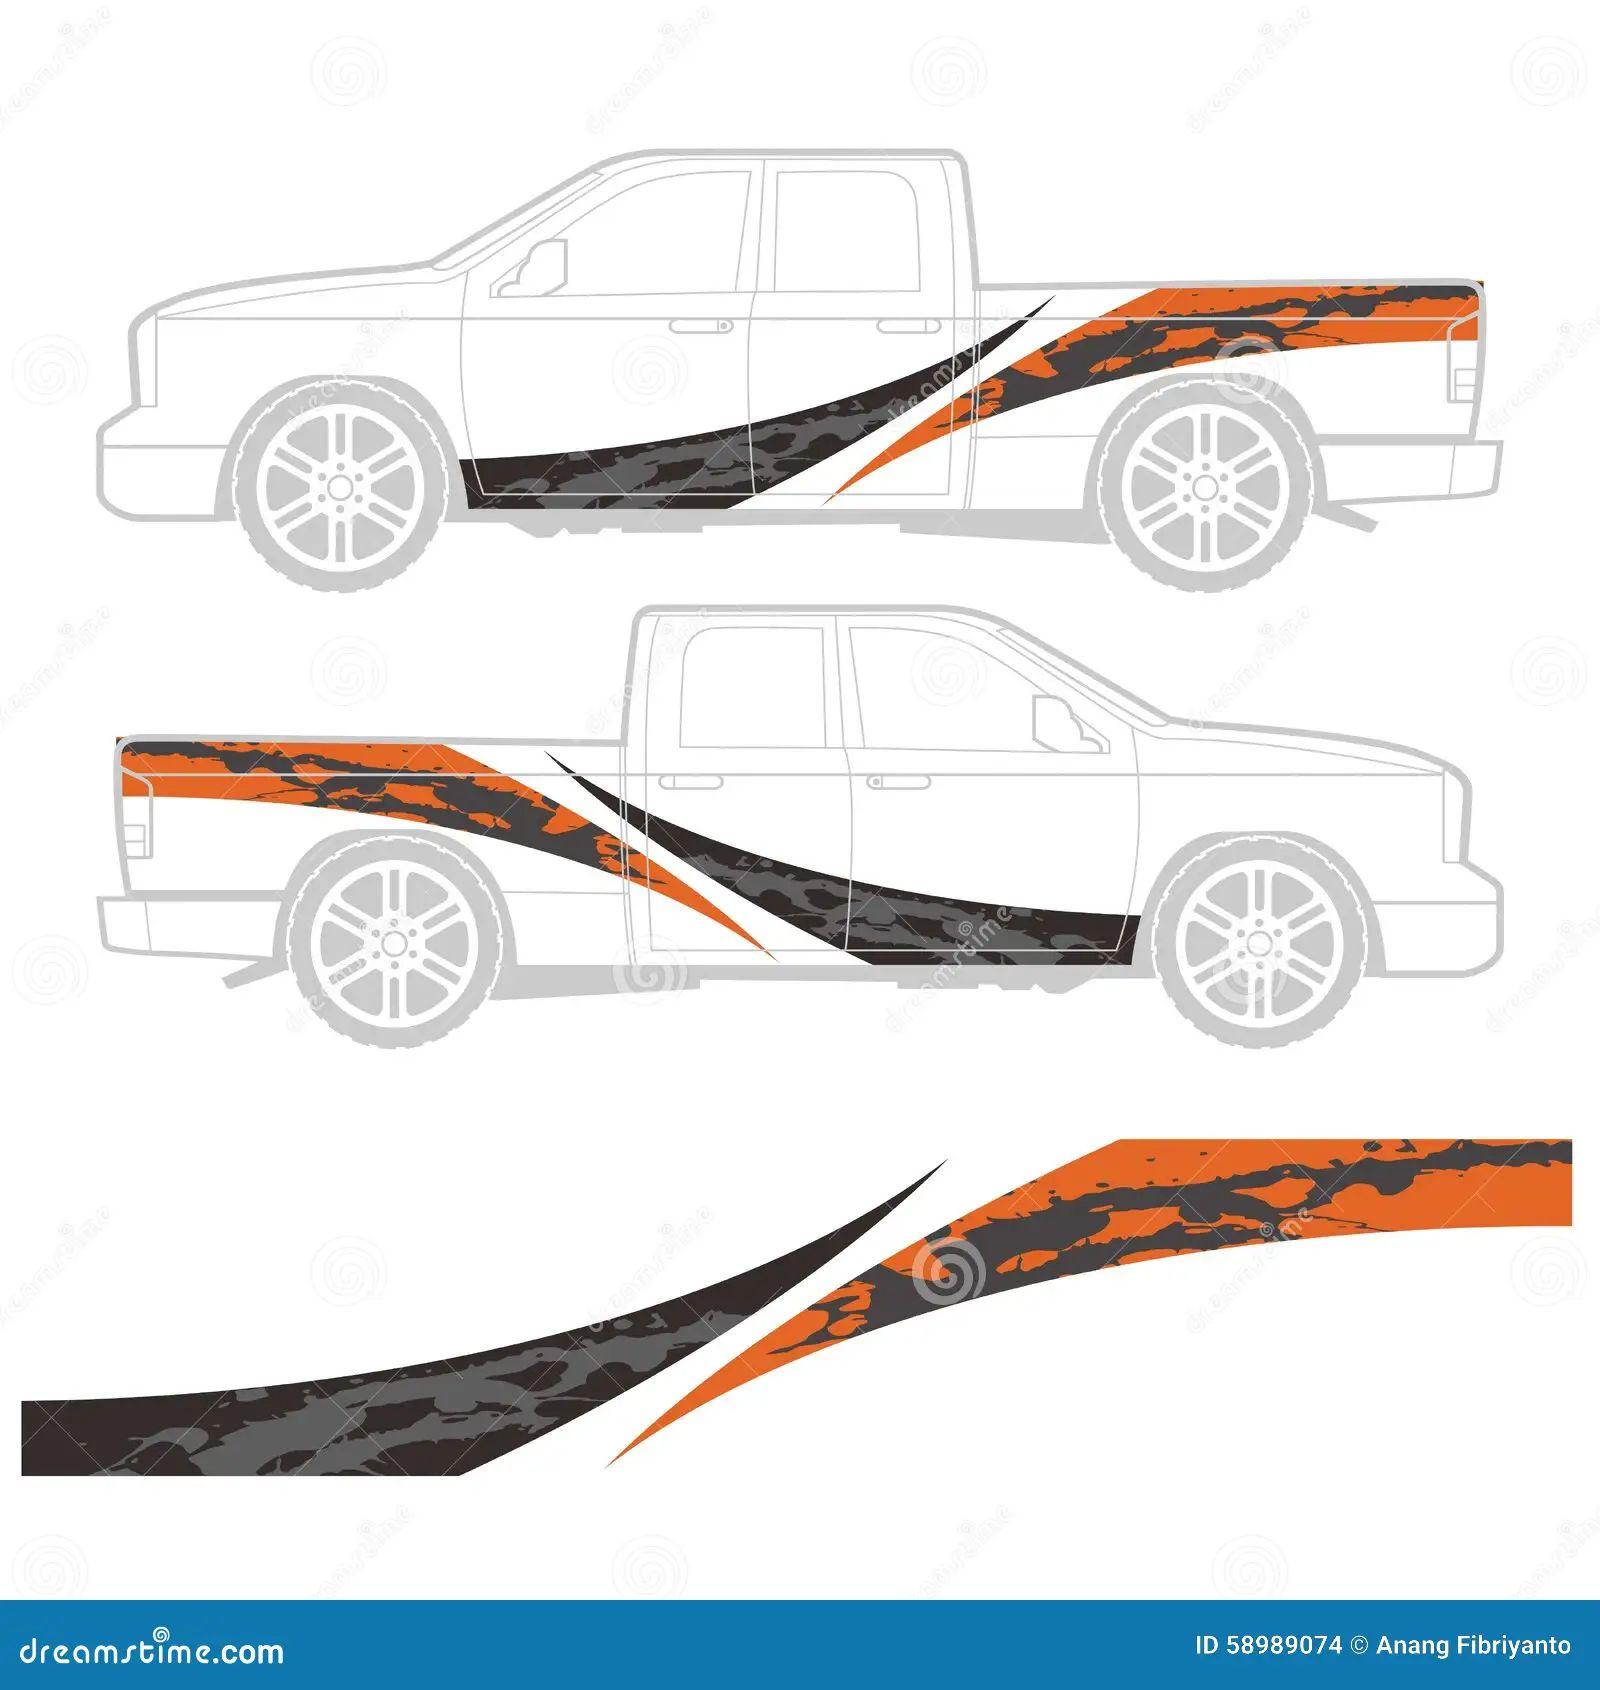 Car body sticker design eps -  Decal Design Graphic Truck Vehicle Download